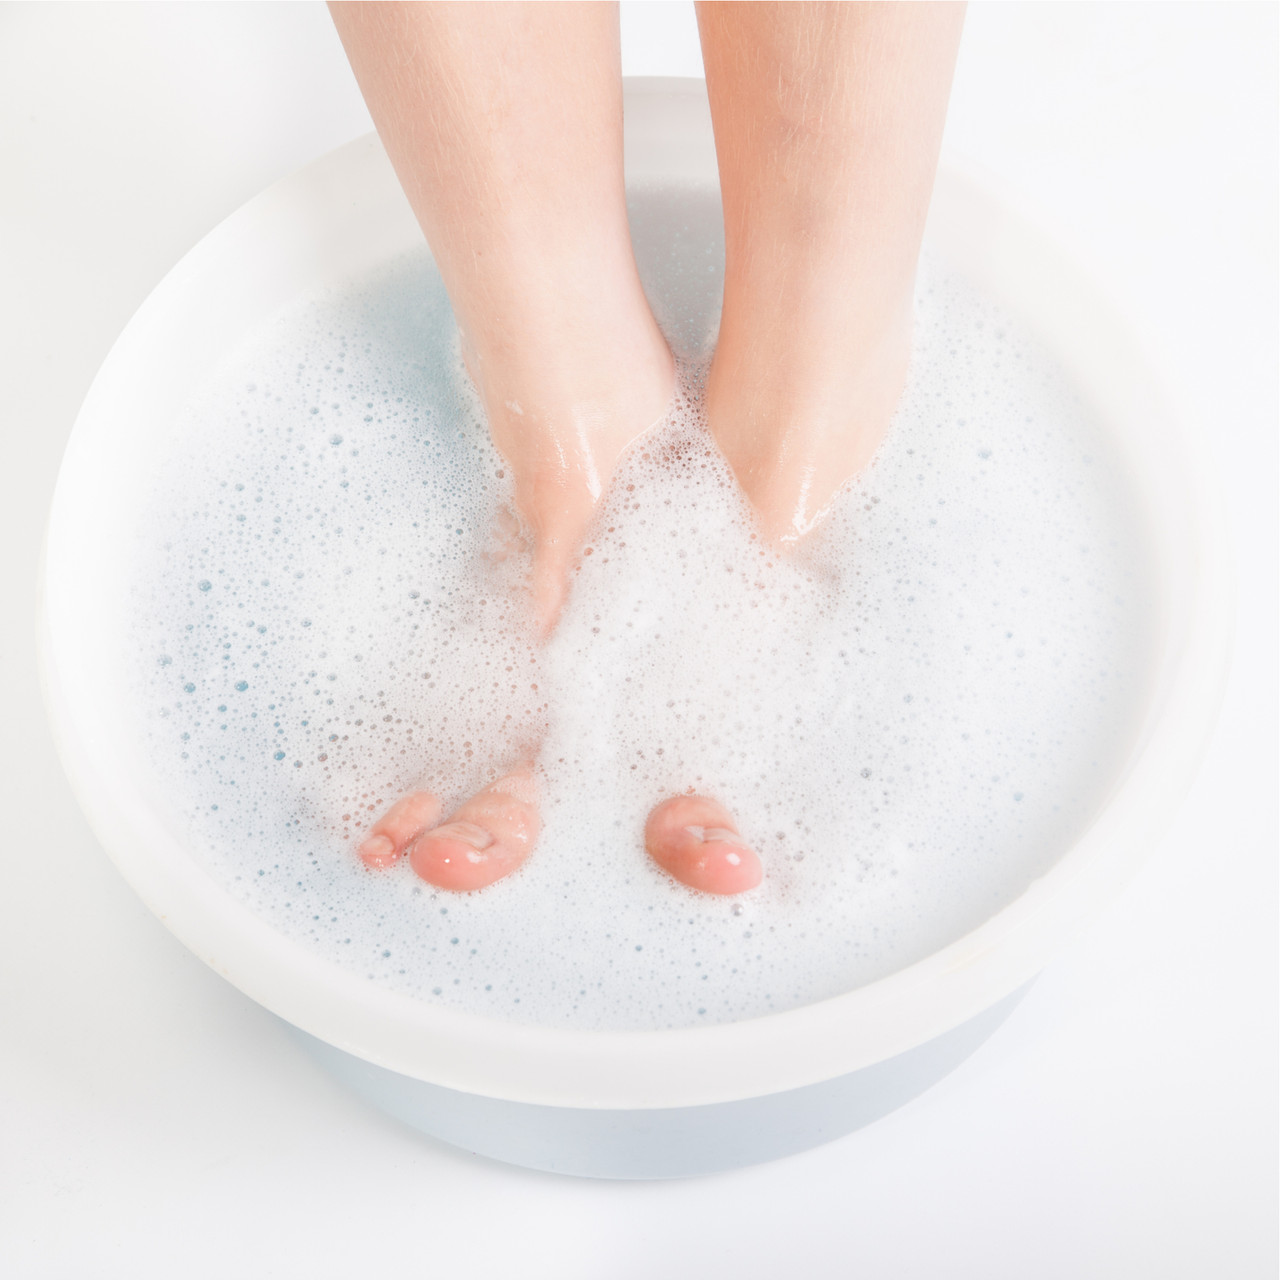 Foot Soak All-Natural Fizzy Blast - Vegan Bath Bomb for Feet